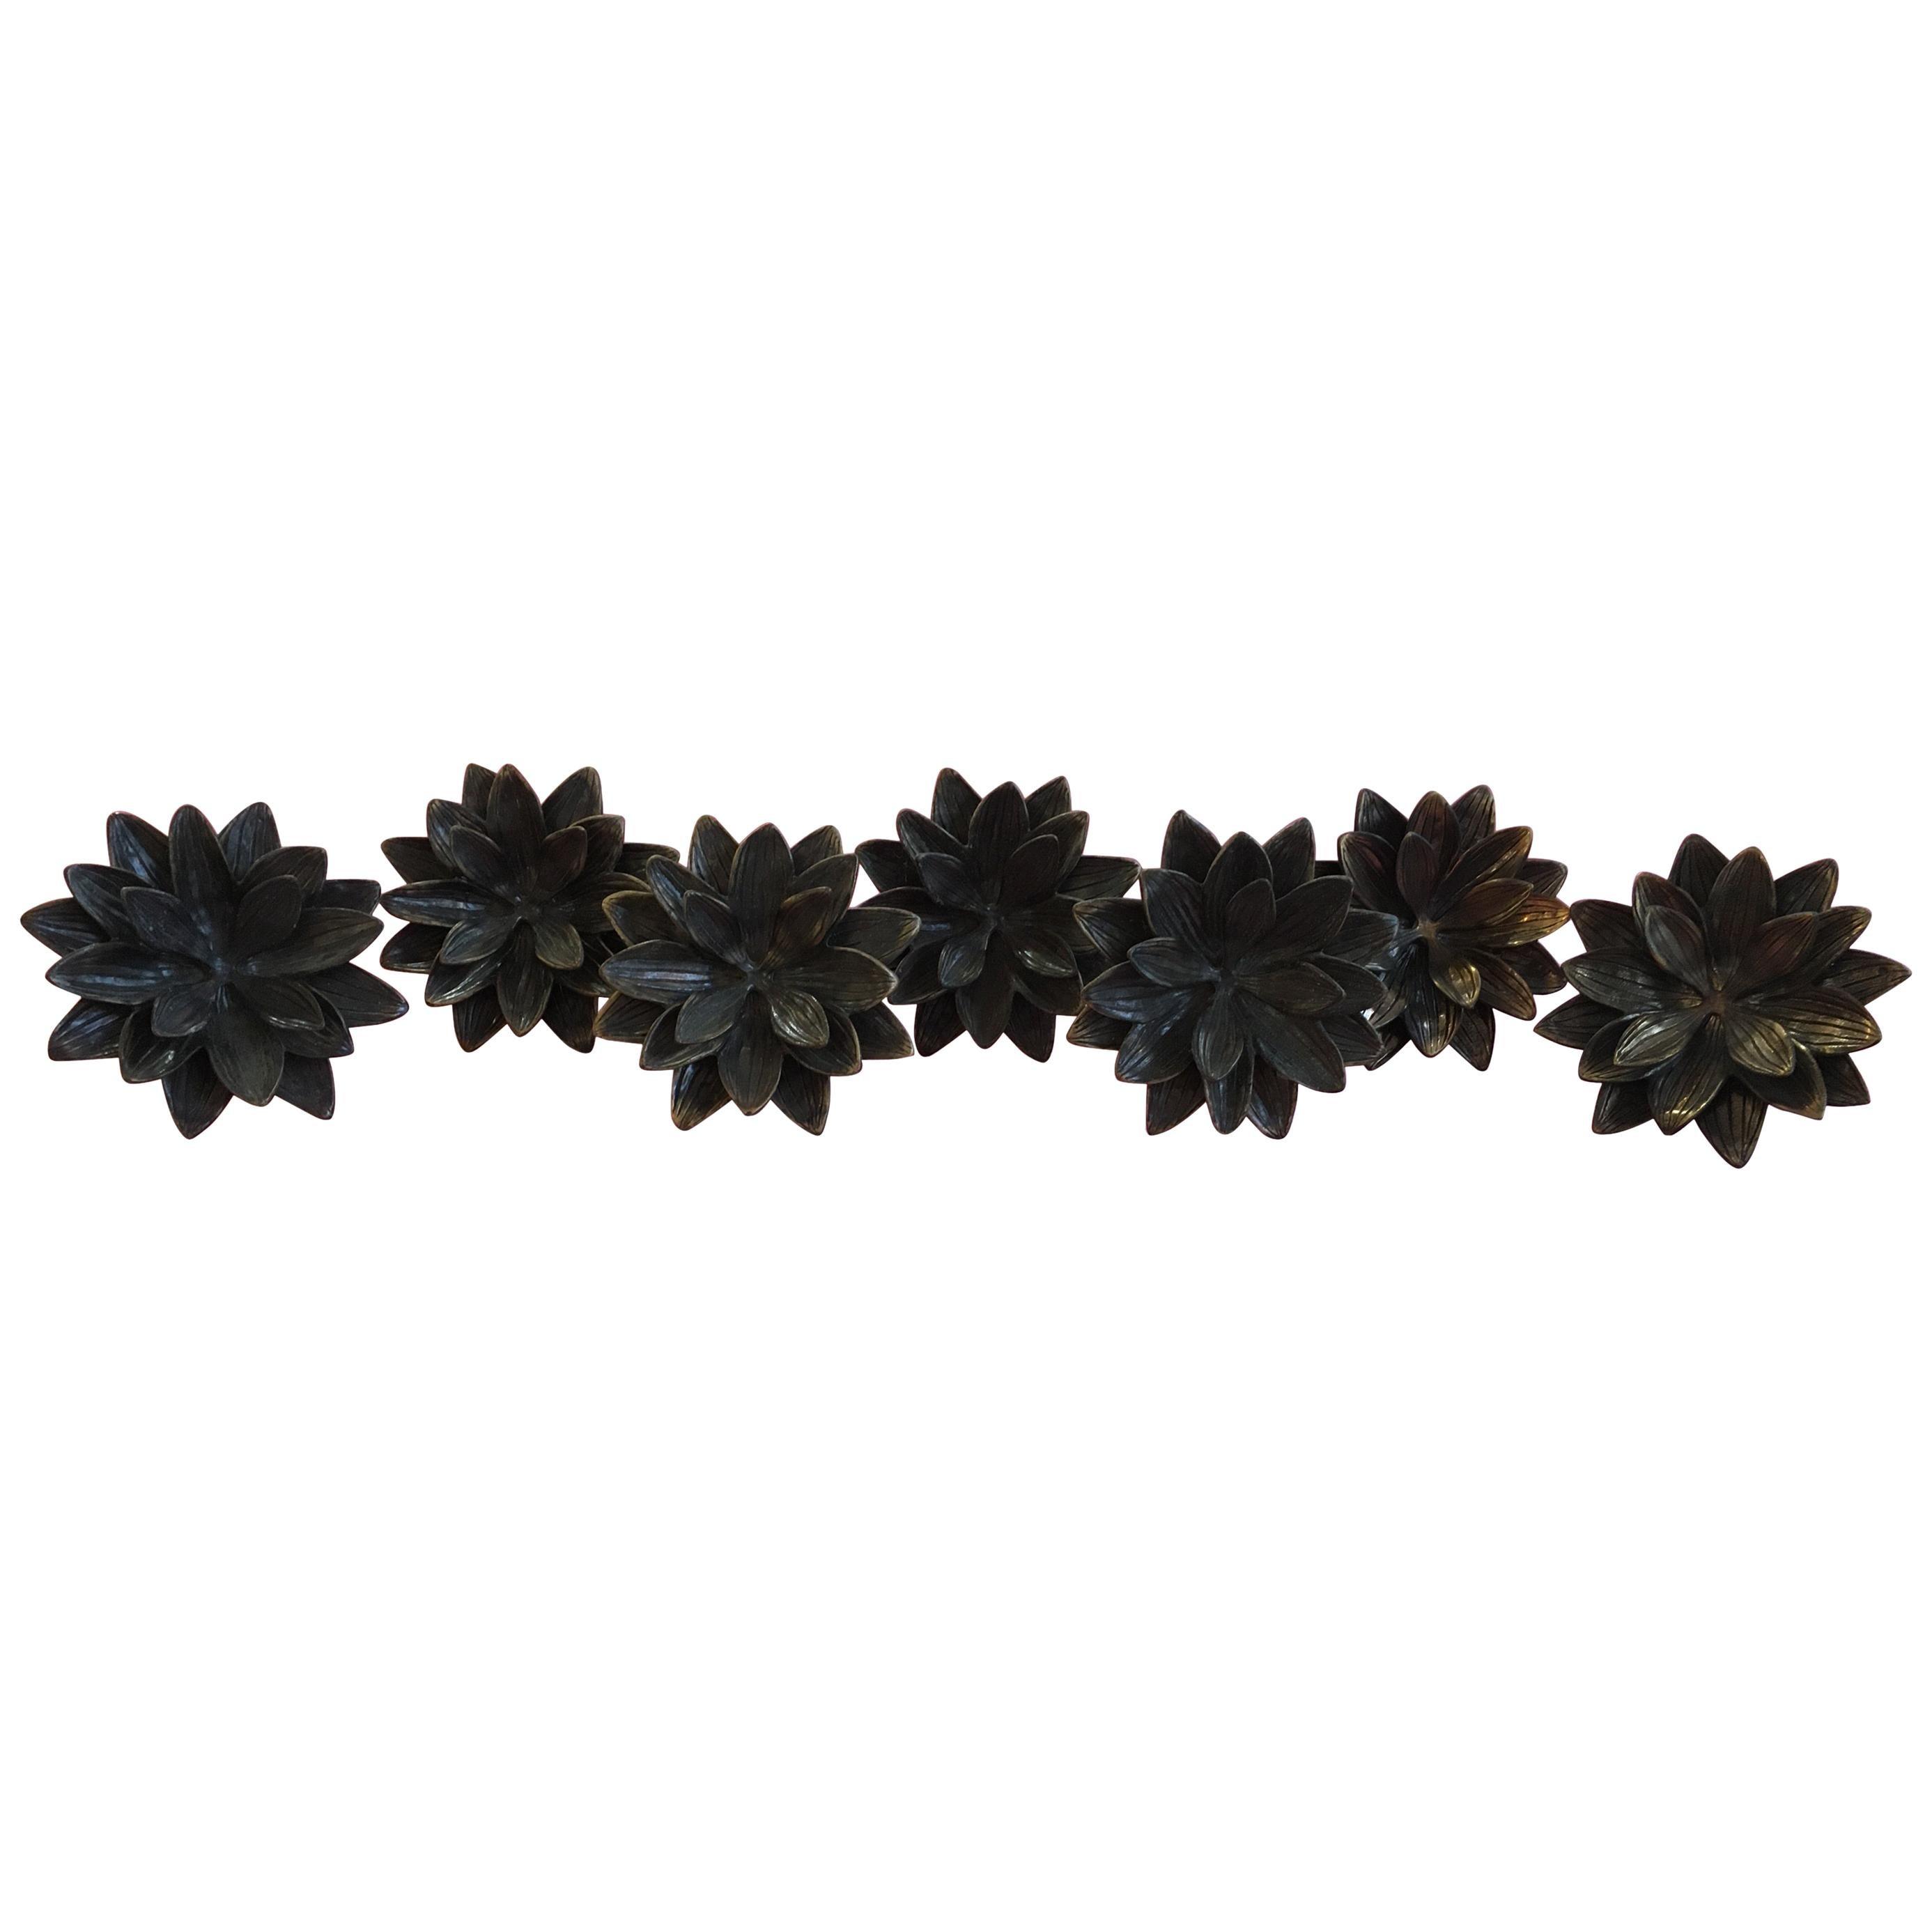 Set of 6 Brass Lotus Flower Drapery Tie Backs or Rod Holders